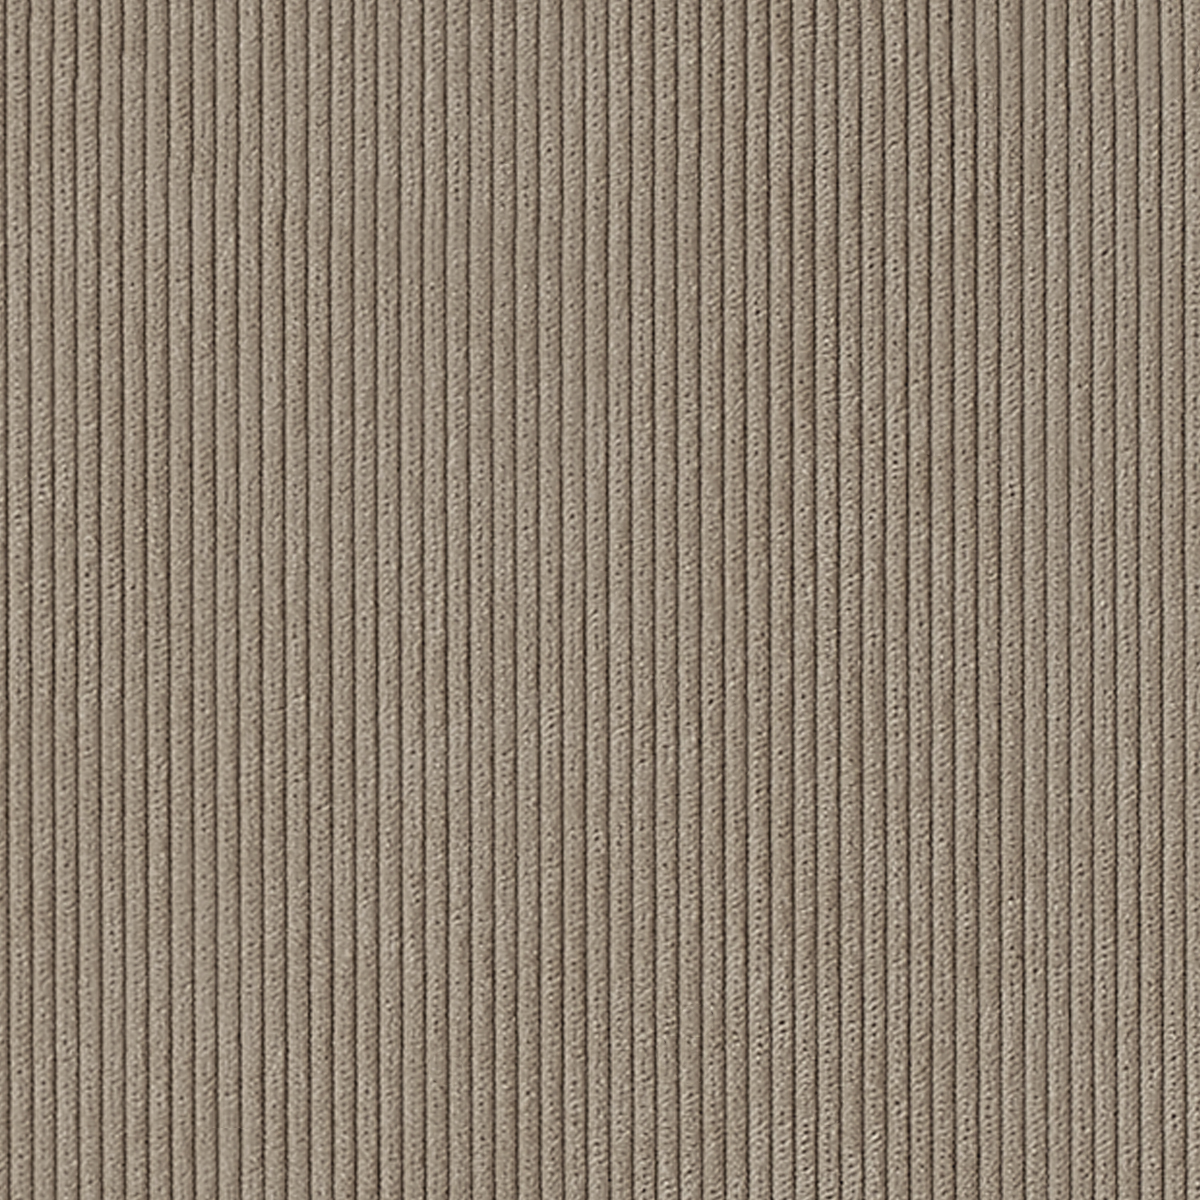 8919_TuftedTan_CorduroyCloth